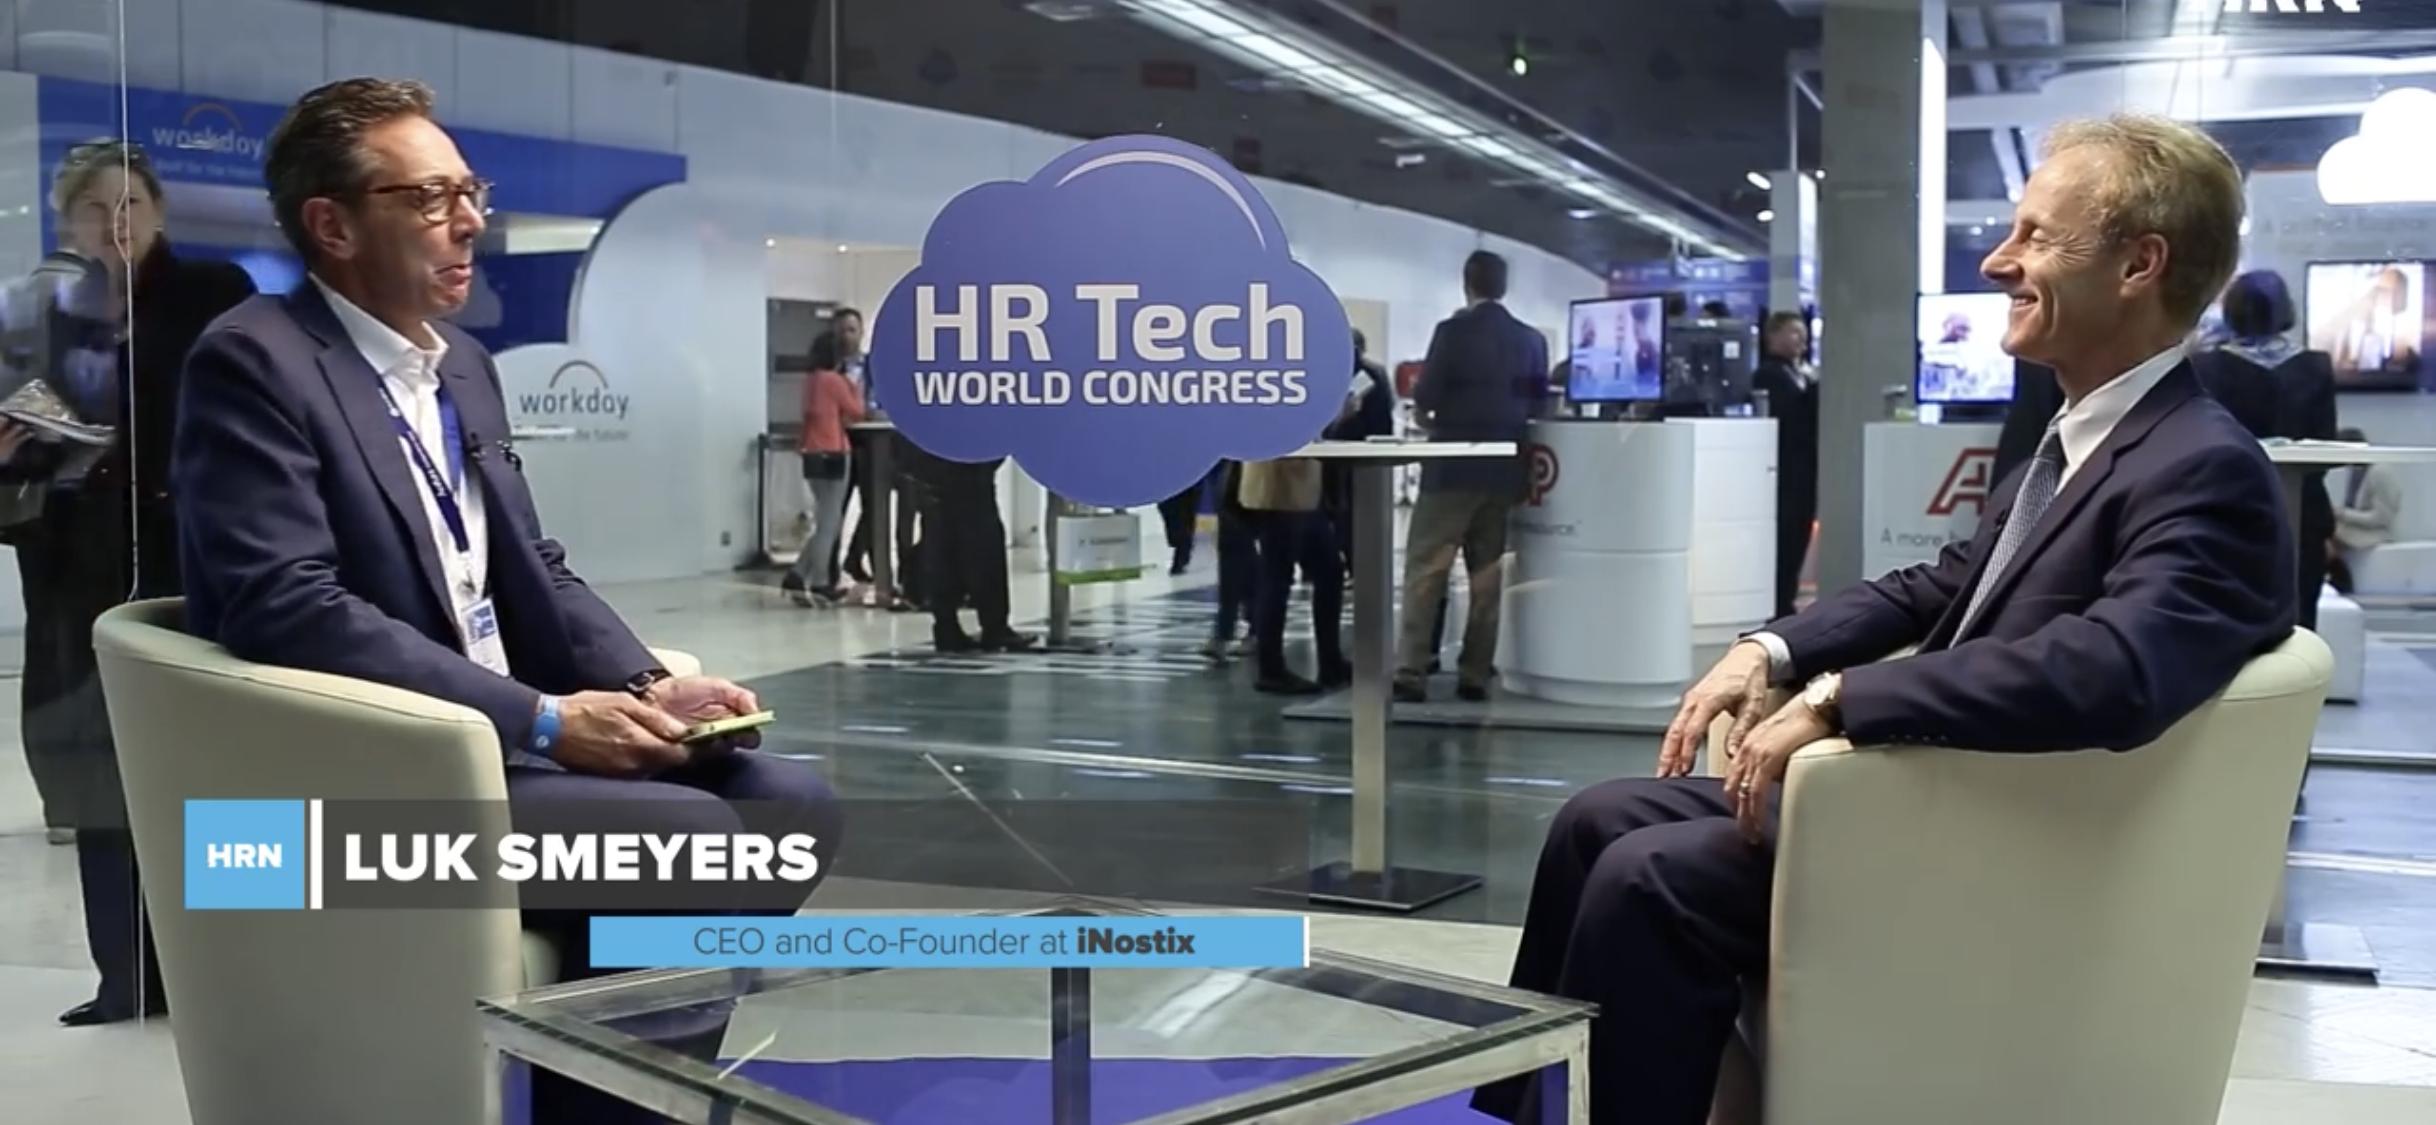 Luk Smeyers interviewing global influencer Josh Bersin at the HR Tech World Congress in 2017